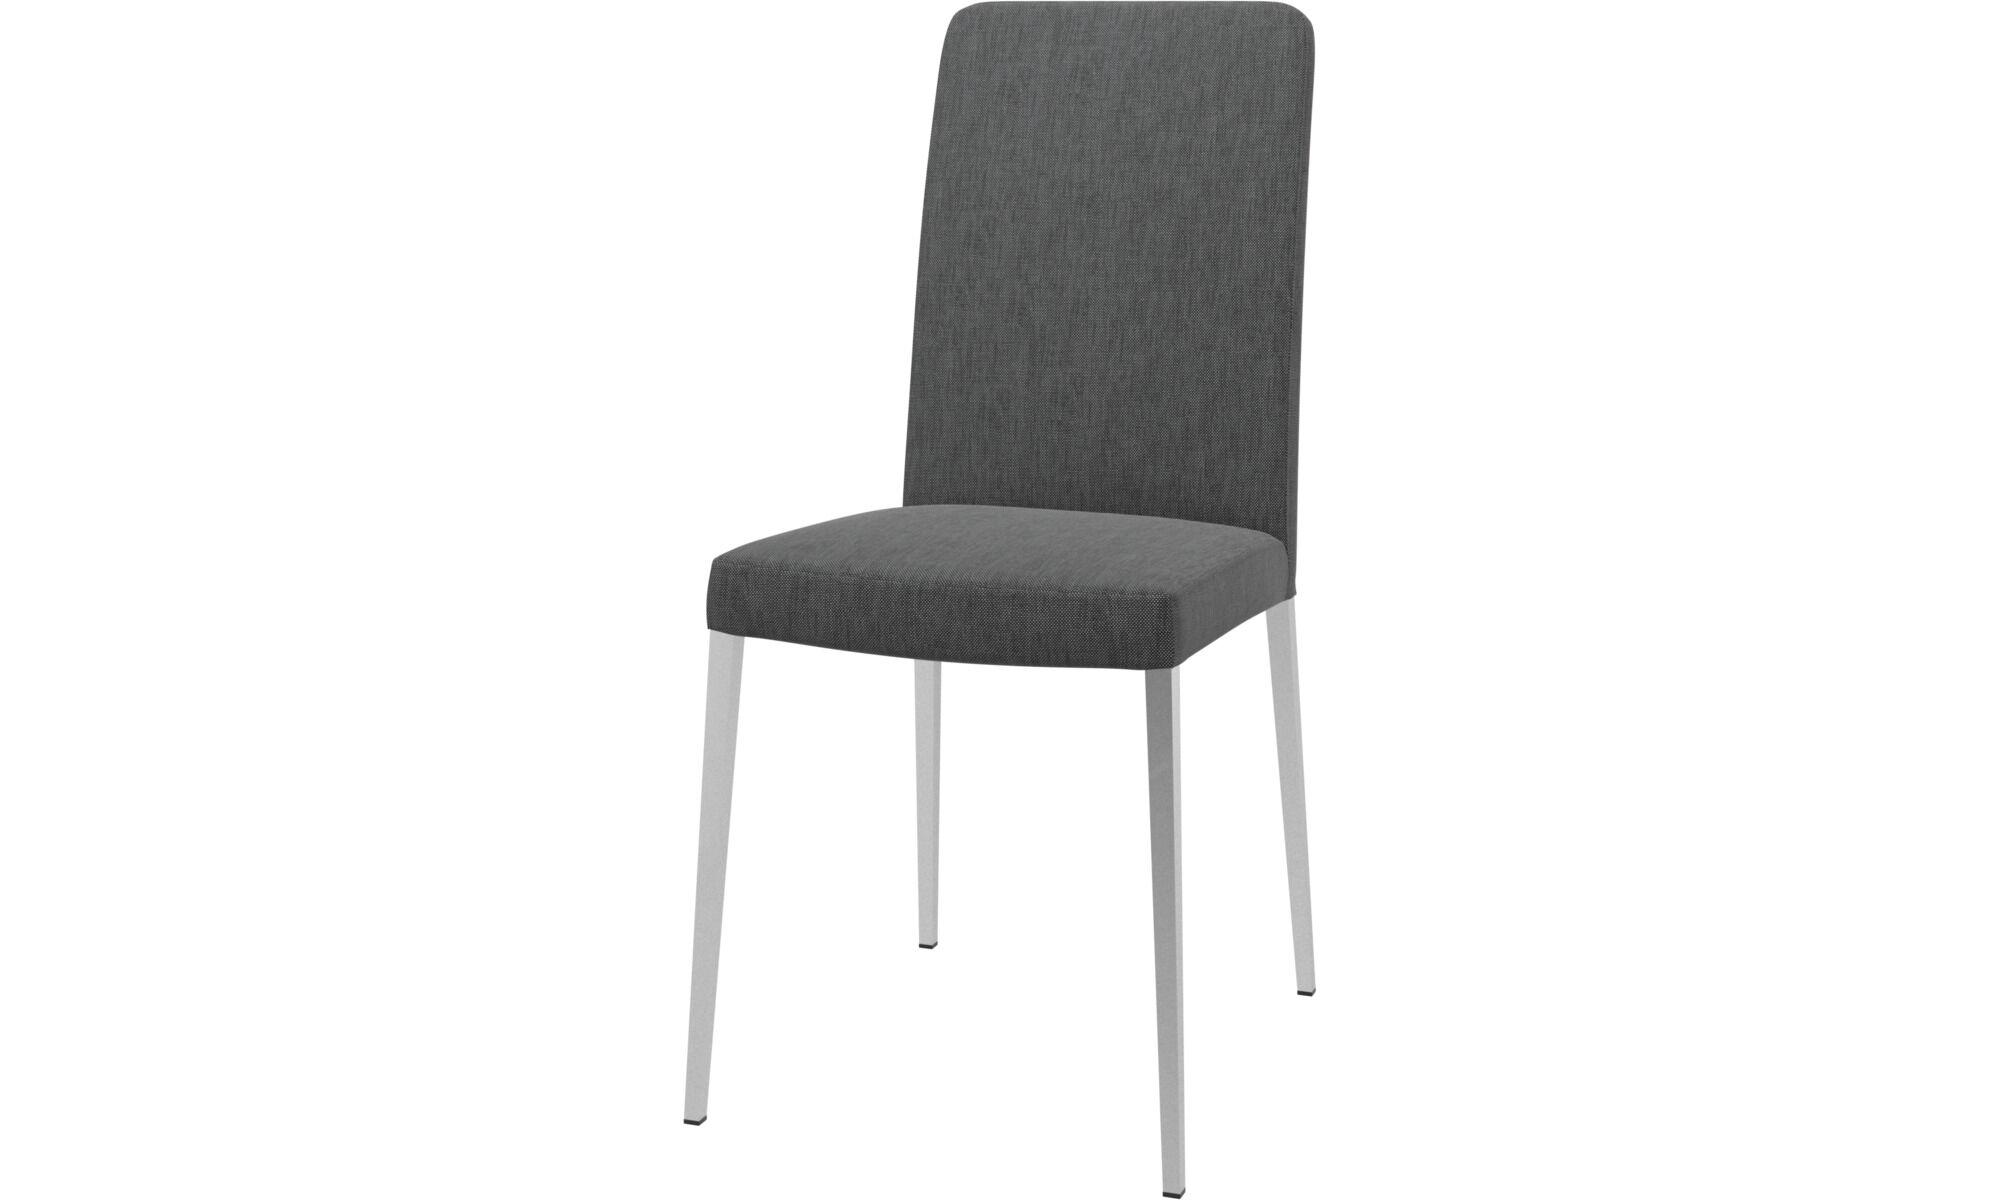 Incroyable Dining Chairs   Nico Chair   Gray   Fabric ...